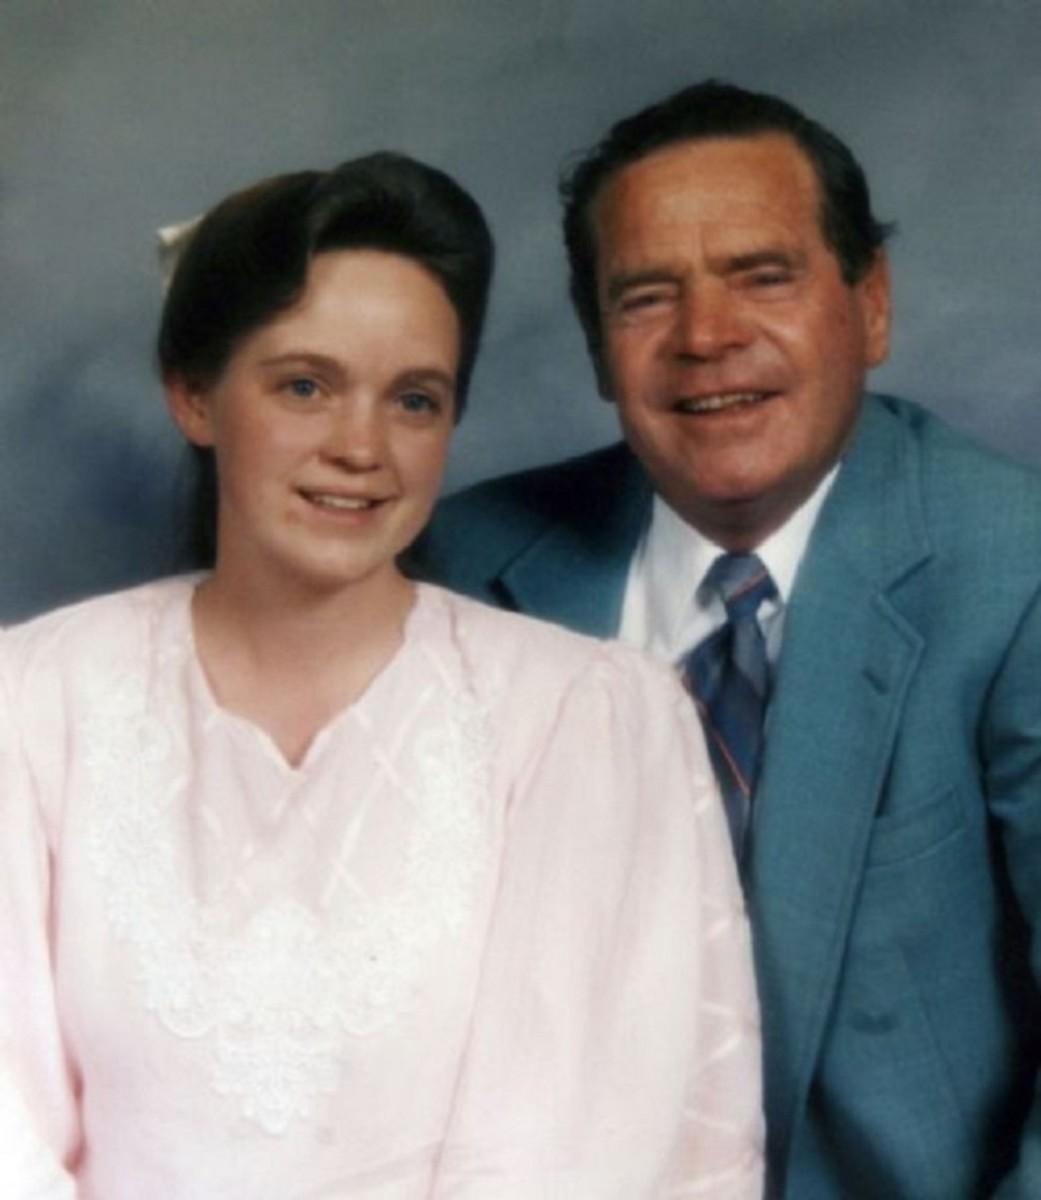 Merril and Carolyn Jessop